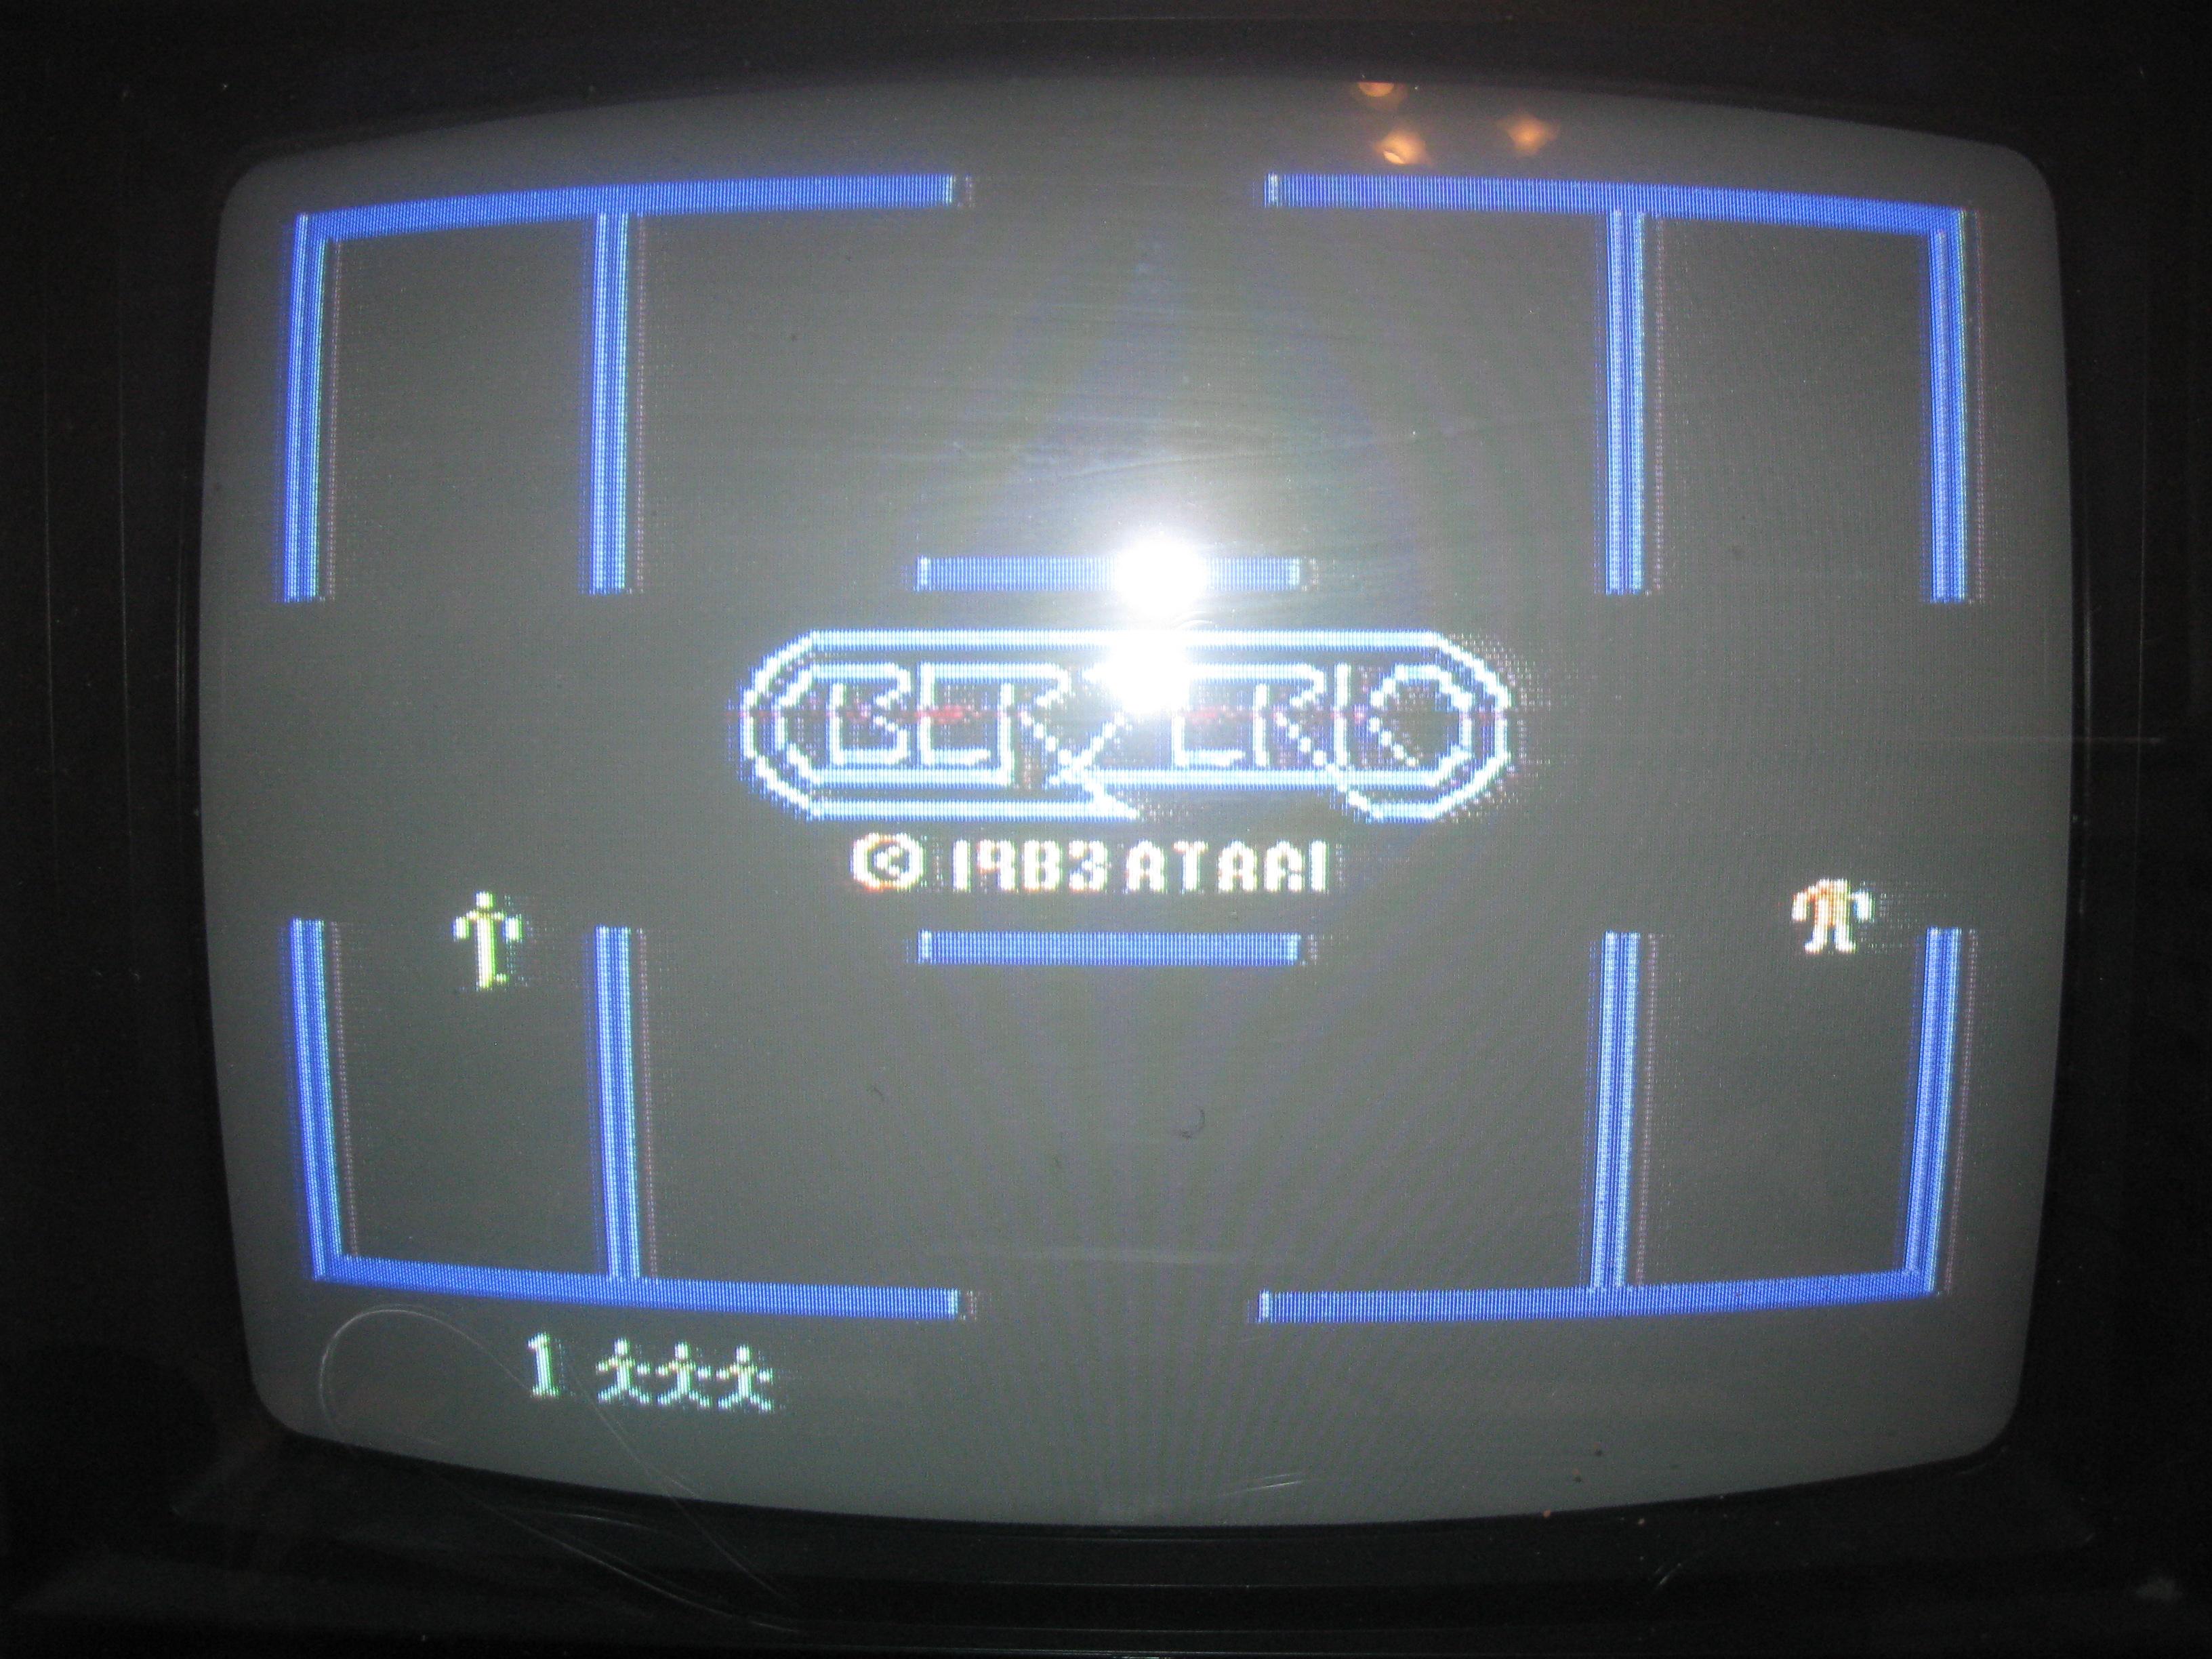 Berzerk: Game 1 11,970 points